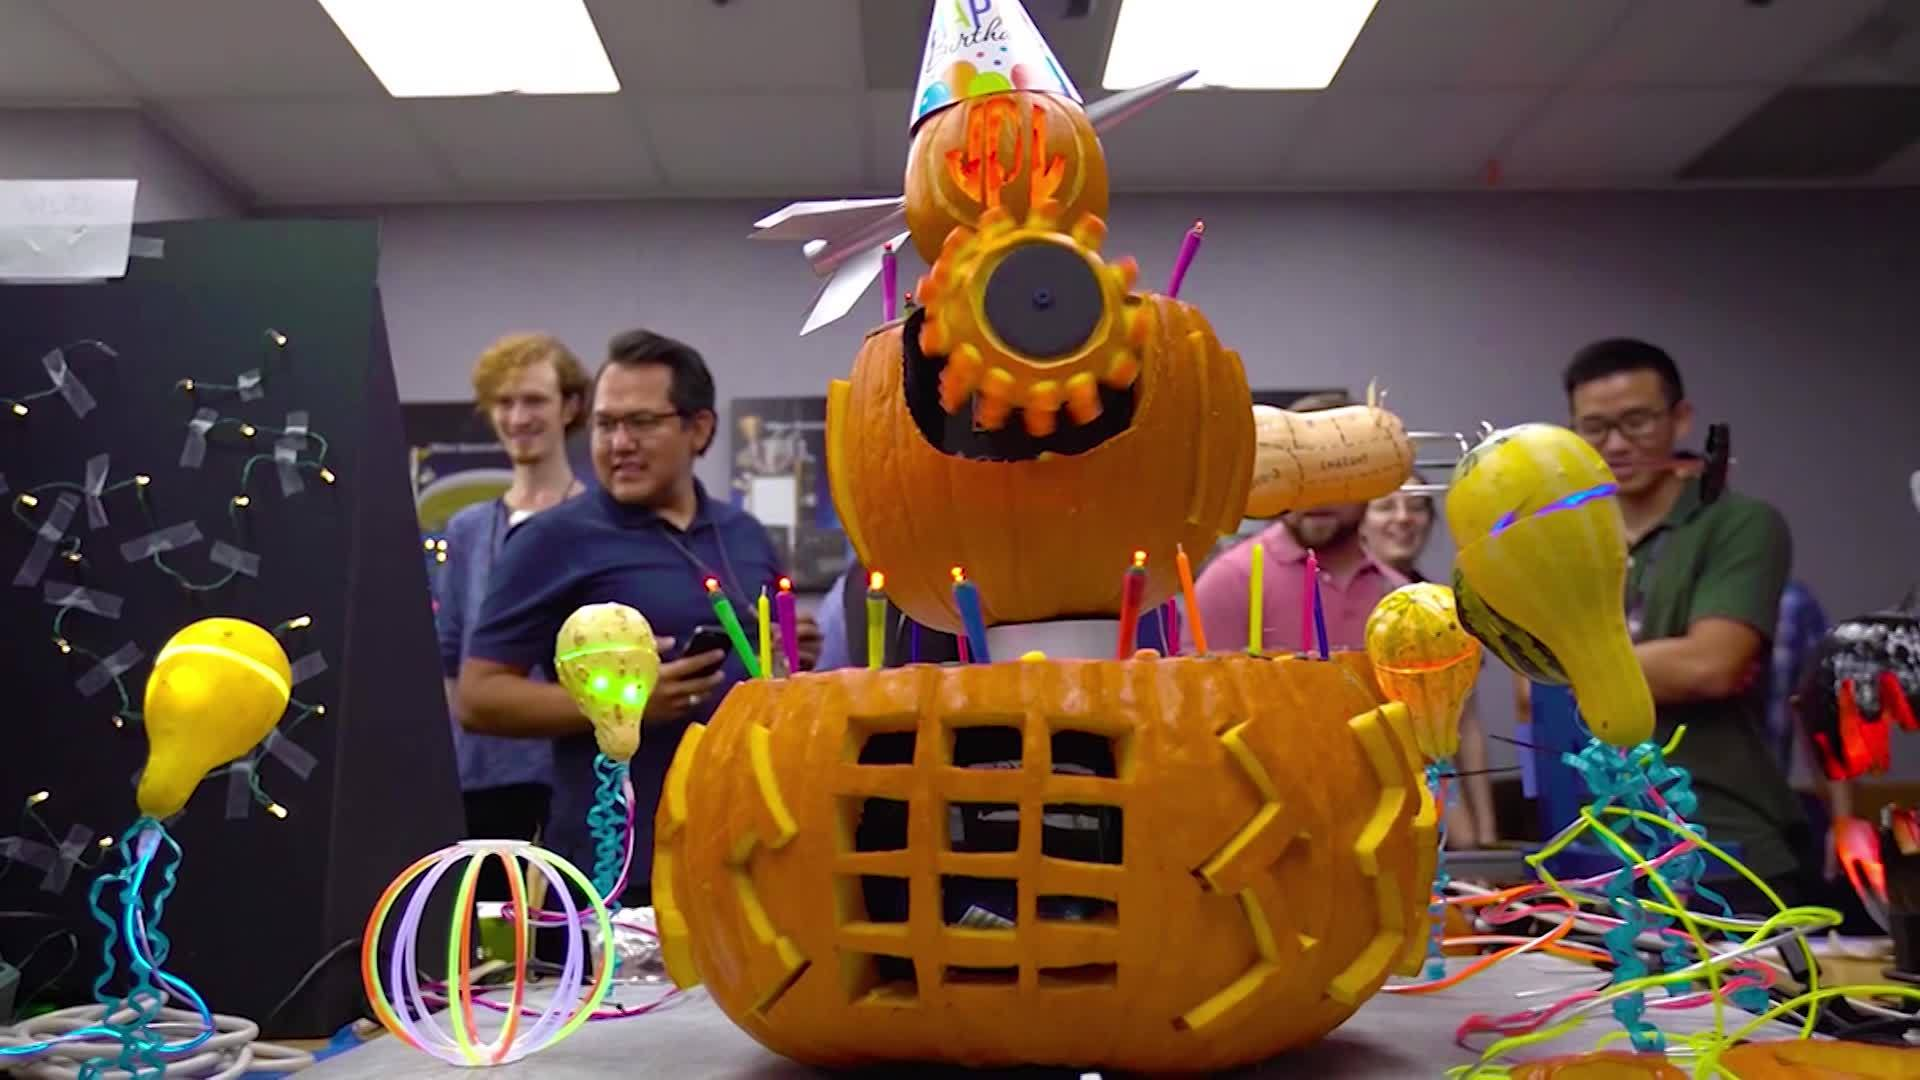 WATCH: NASA engineers get nerdy in pumpkin carving contest